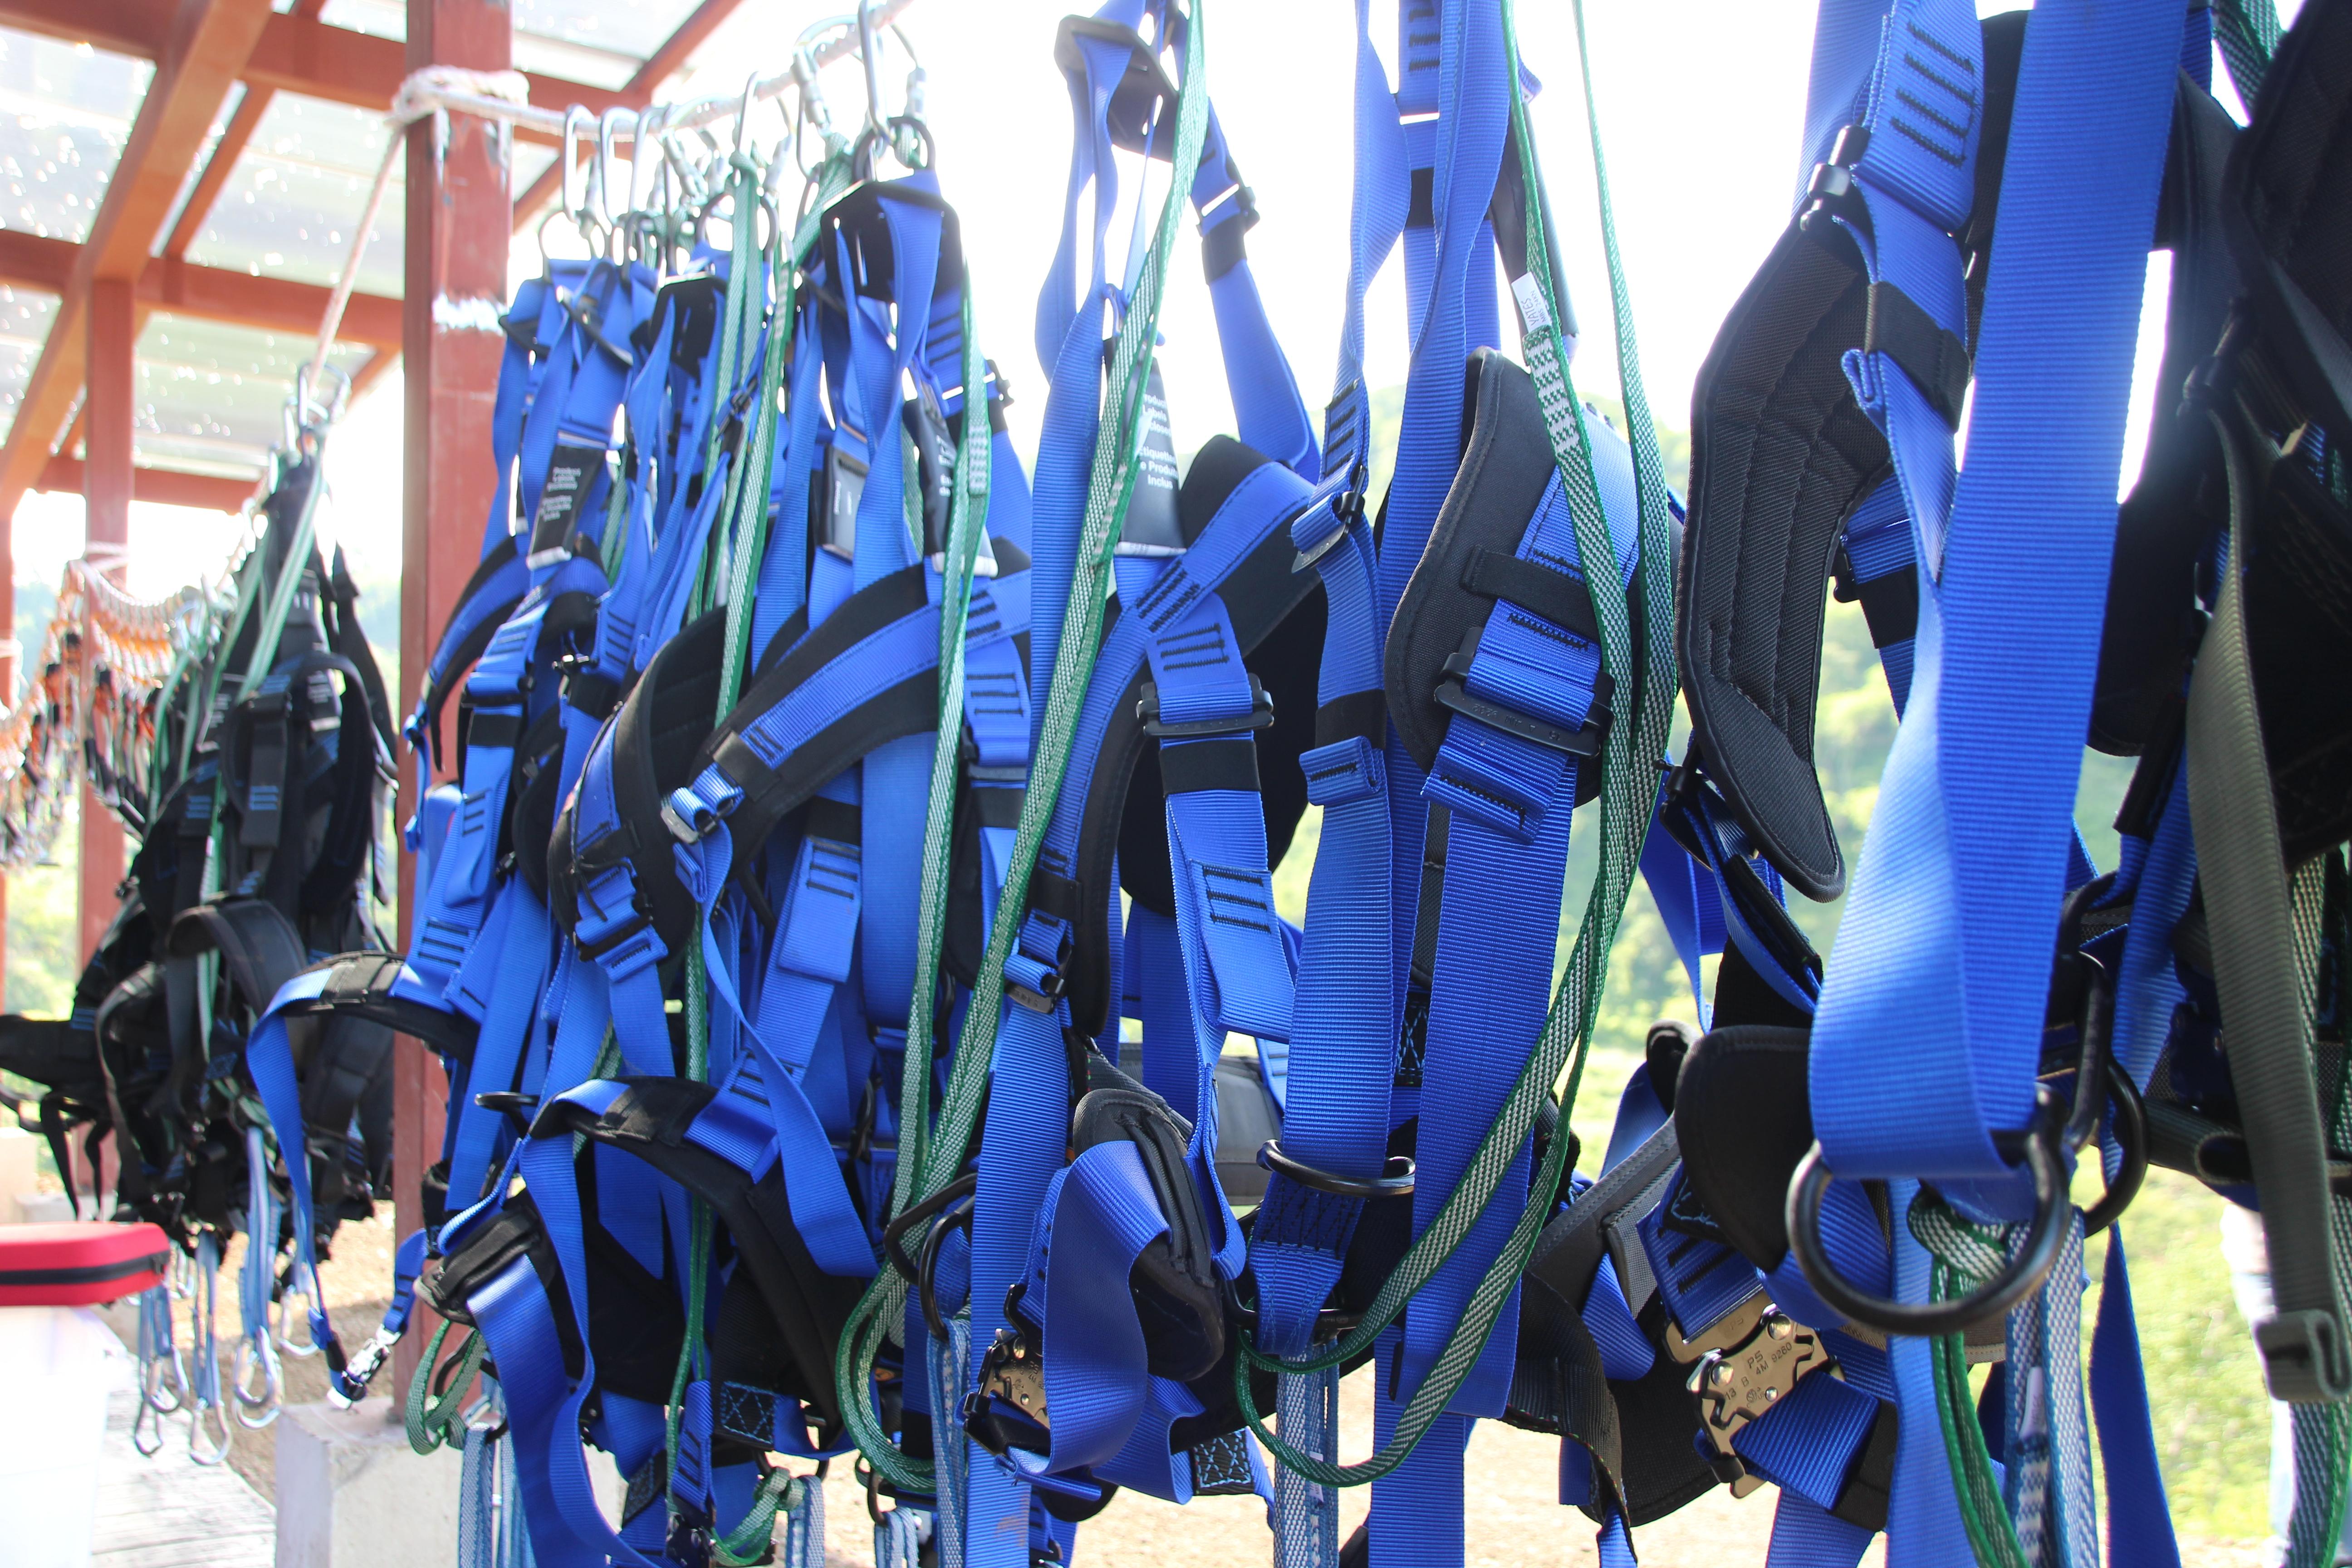 Costa Rica Zip Lines | Tips on Diamante's Superman Zip Line Canopy Tour